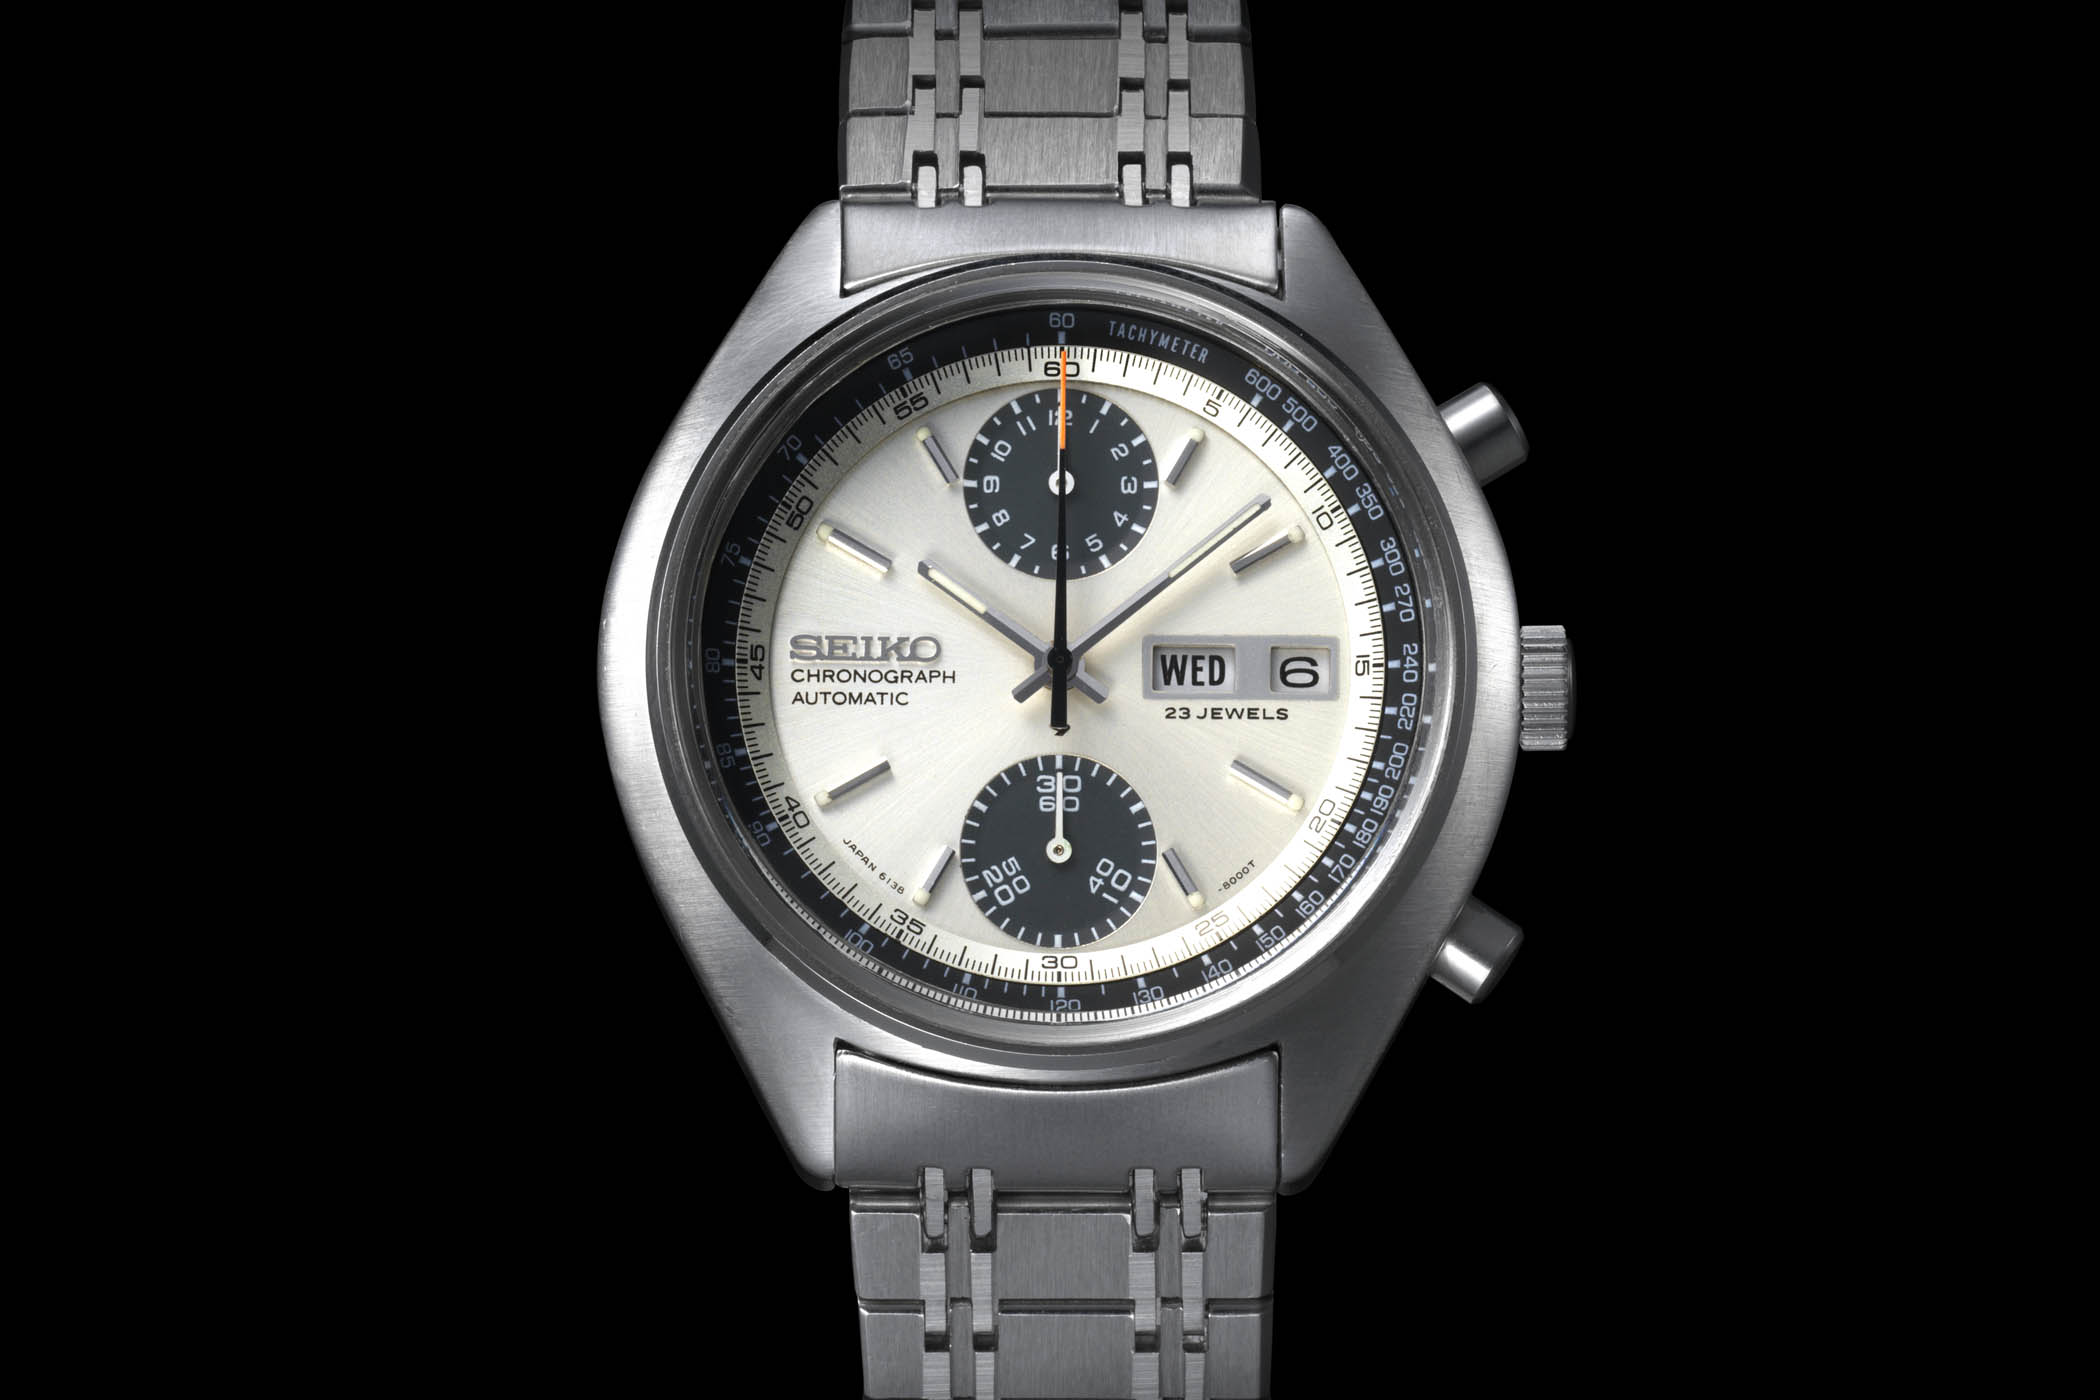 1969 Seiko Panda Chronograph Calibre 6139 - Seiko's first automatic chronograph